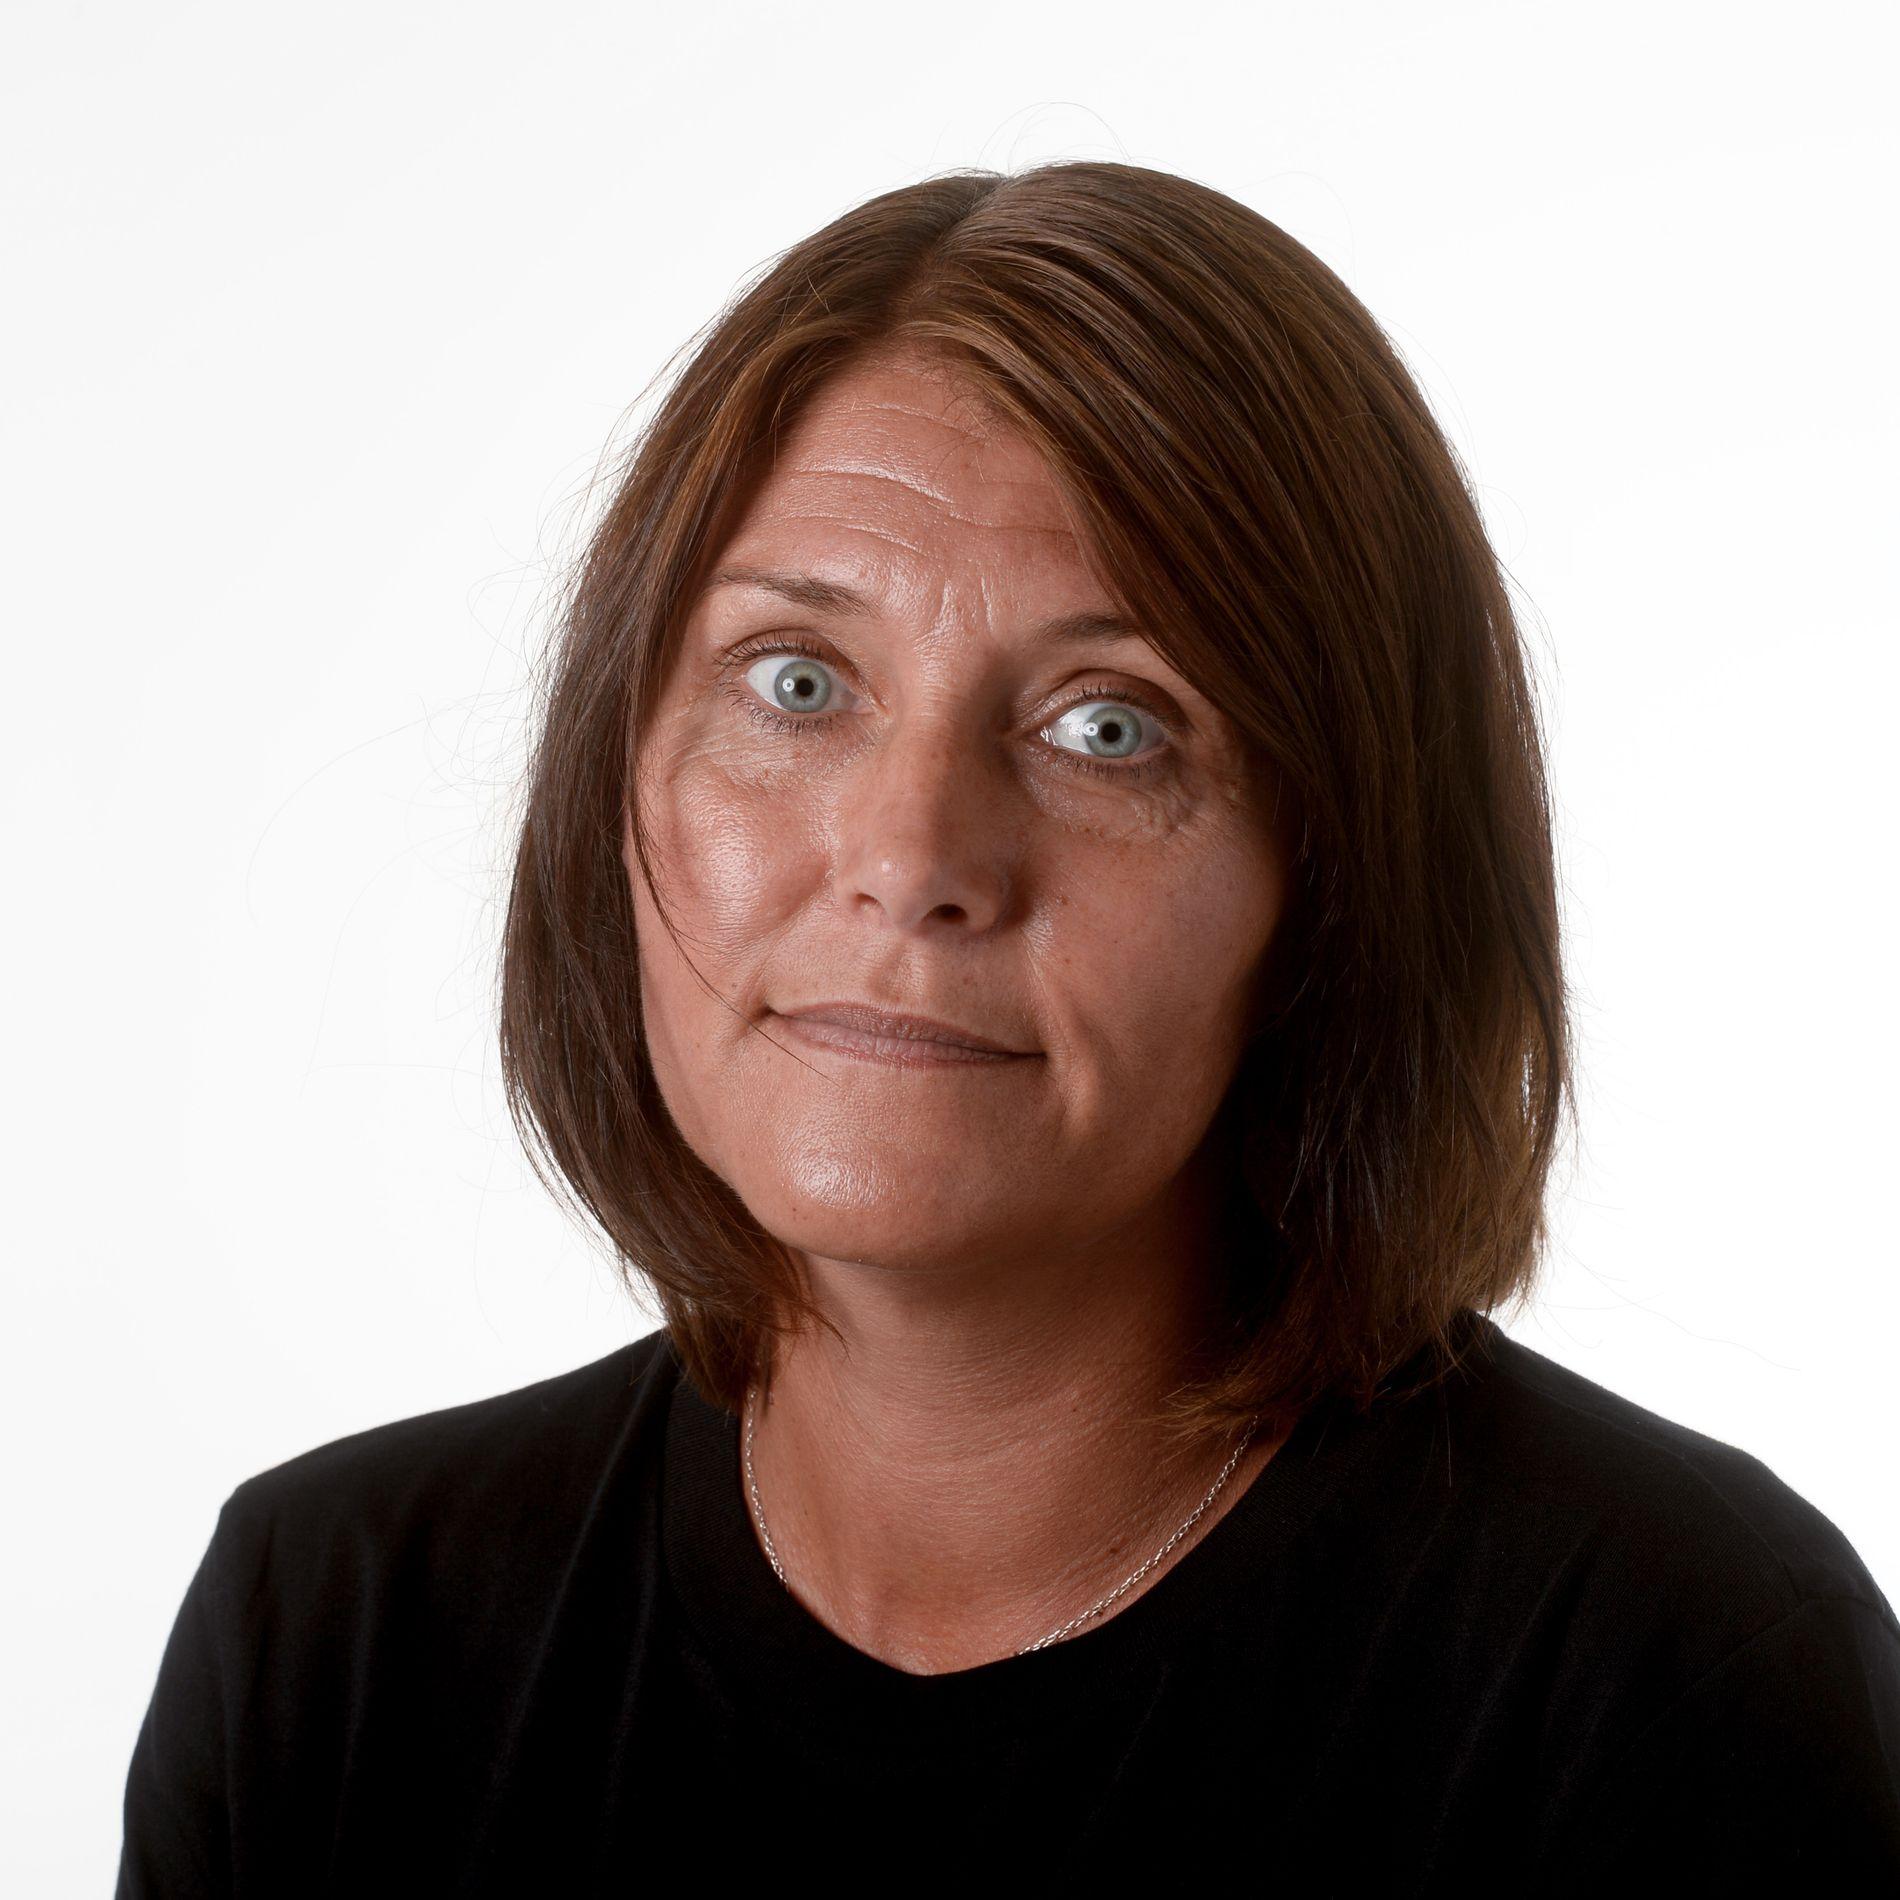 Siv Helen Kvalvåg